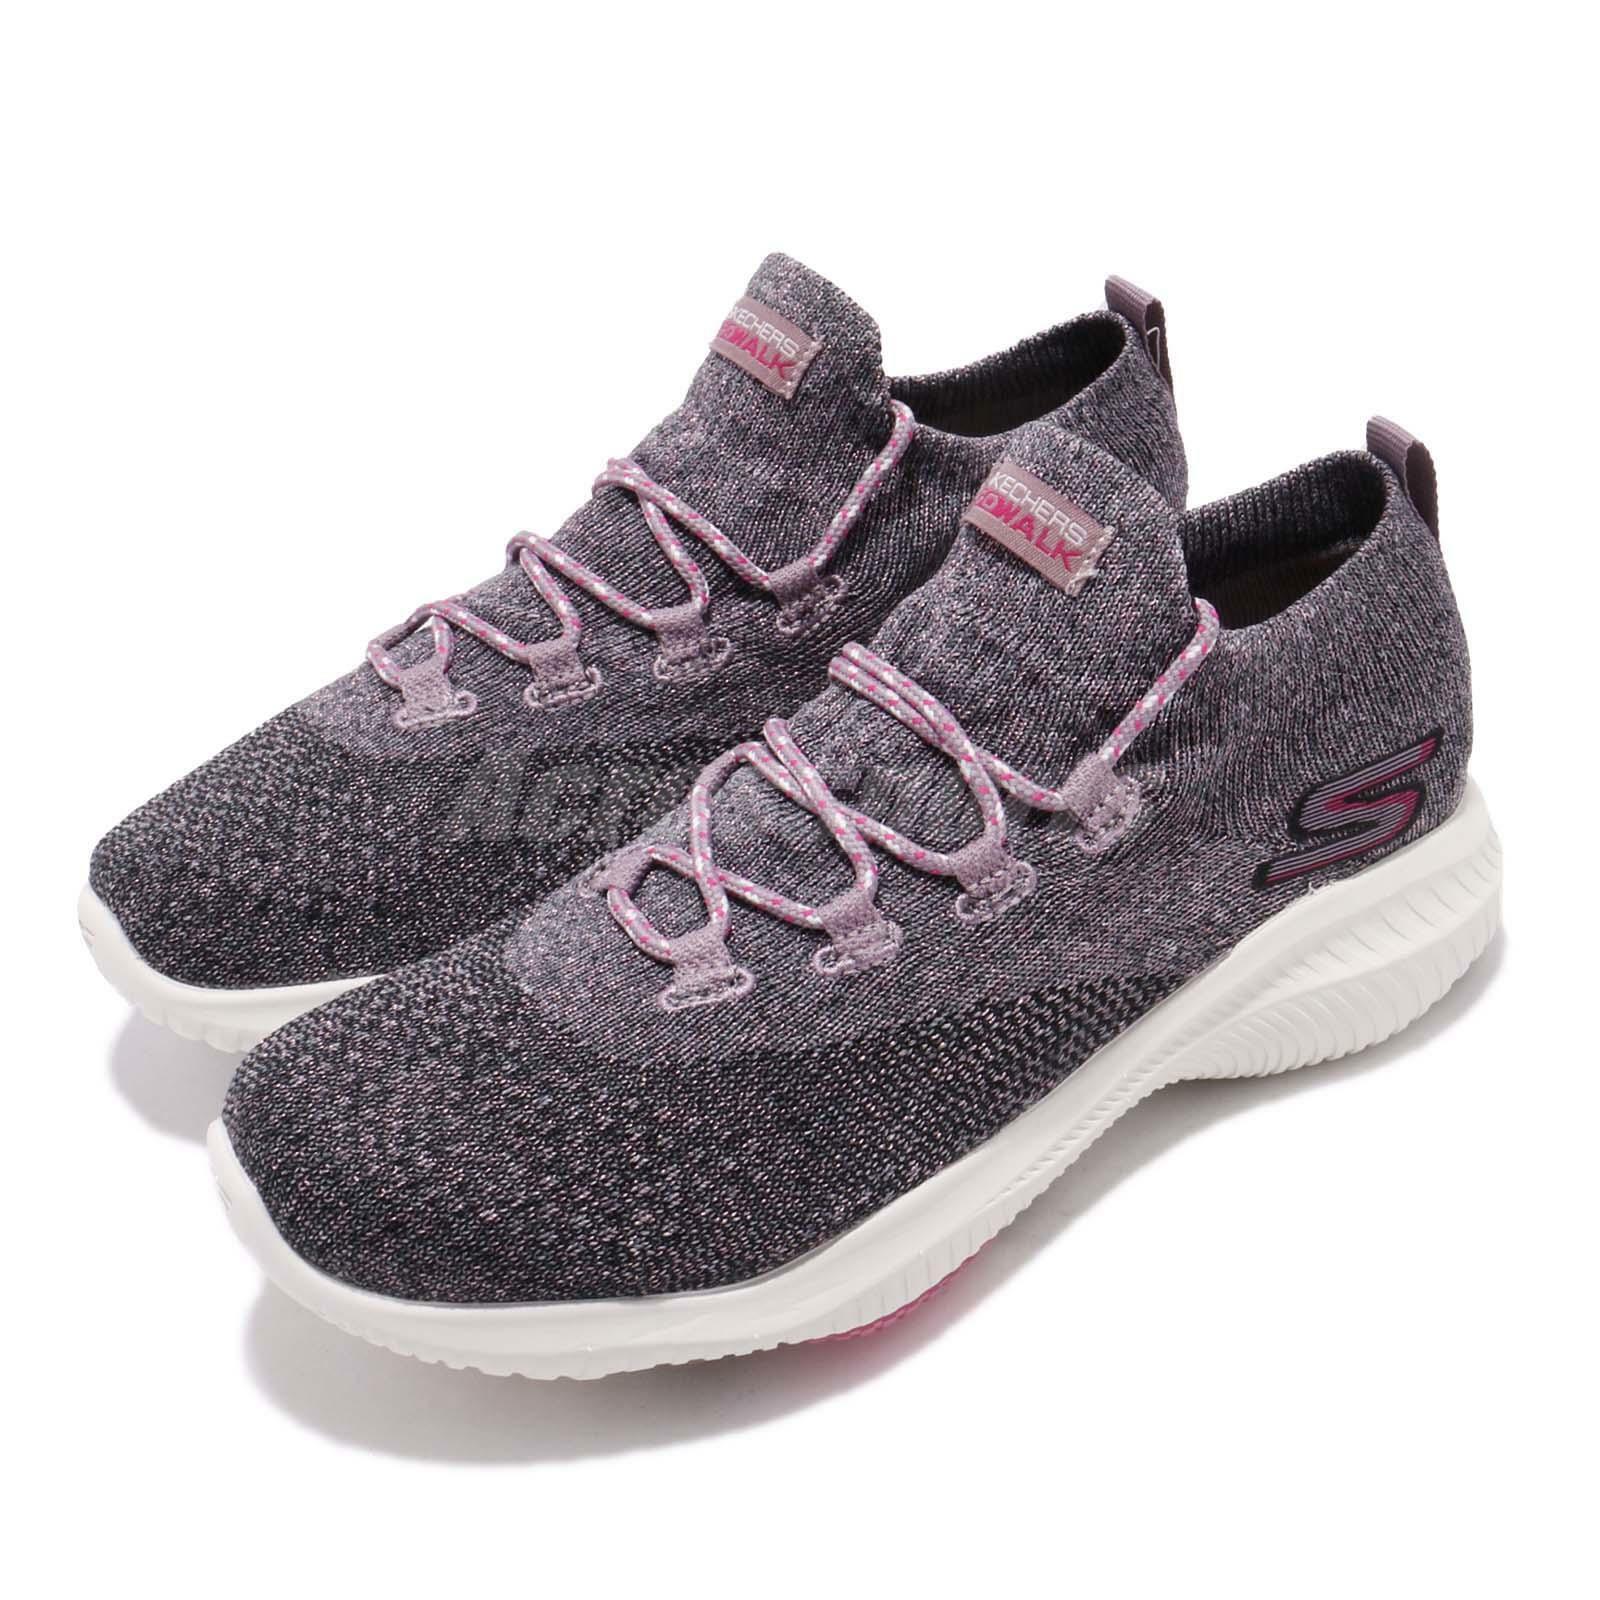 Skechers Go Walk Revolution Ultra-Ventured Black Pink Women shoes 15670-BKPK